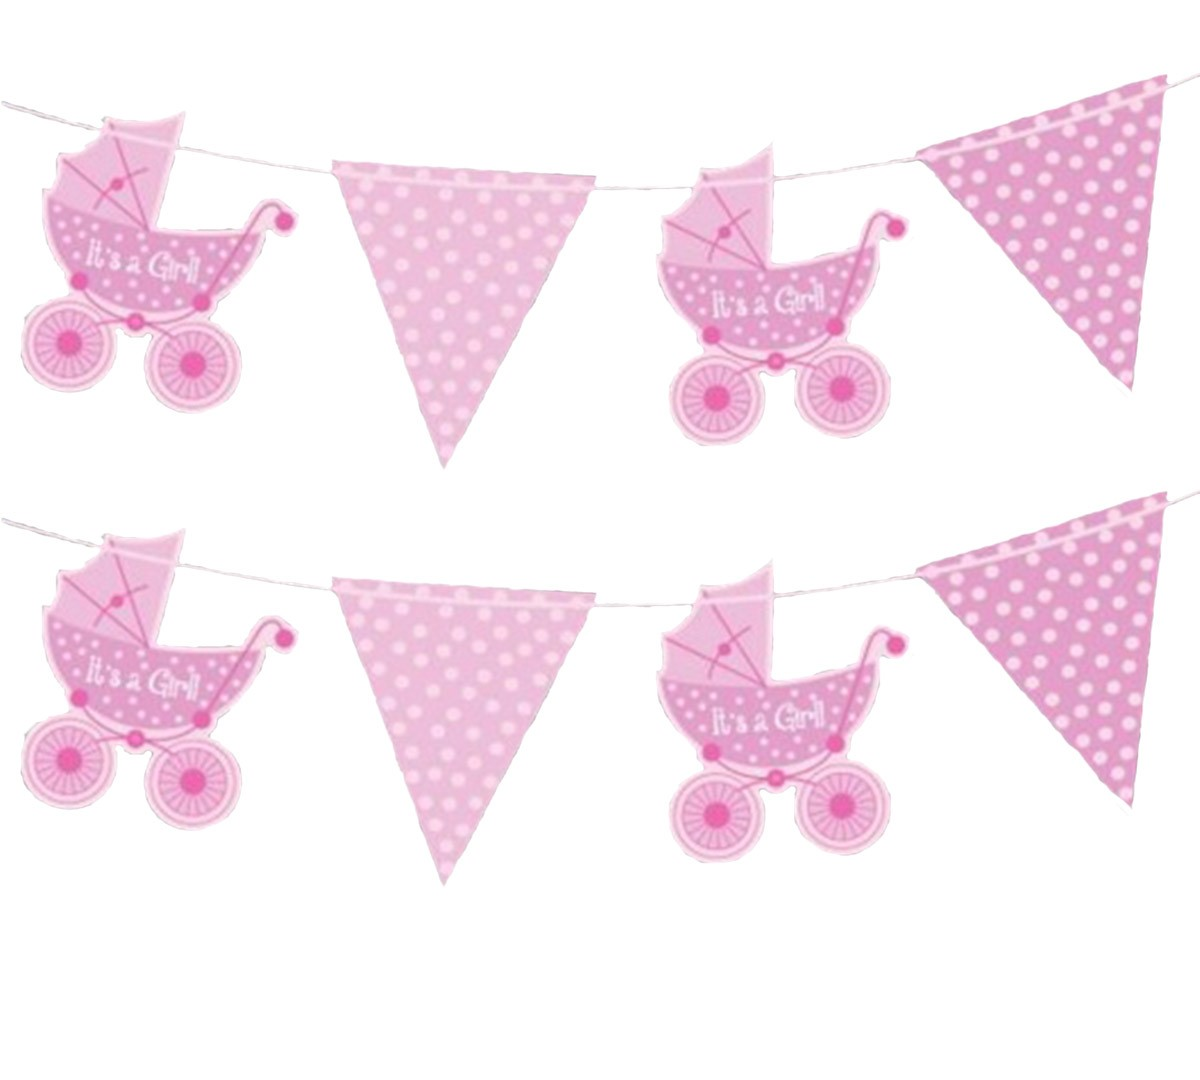 Baby shower empavesado fiesta decoraci n celebraci n nuevo - Decoracion bebe nina ...